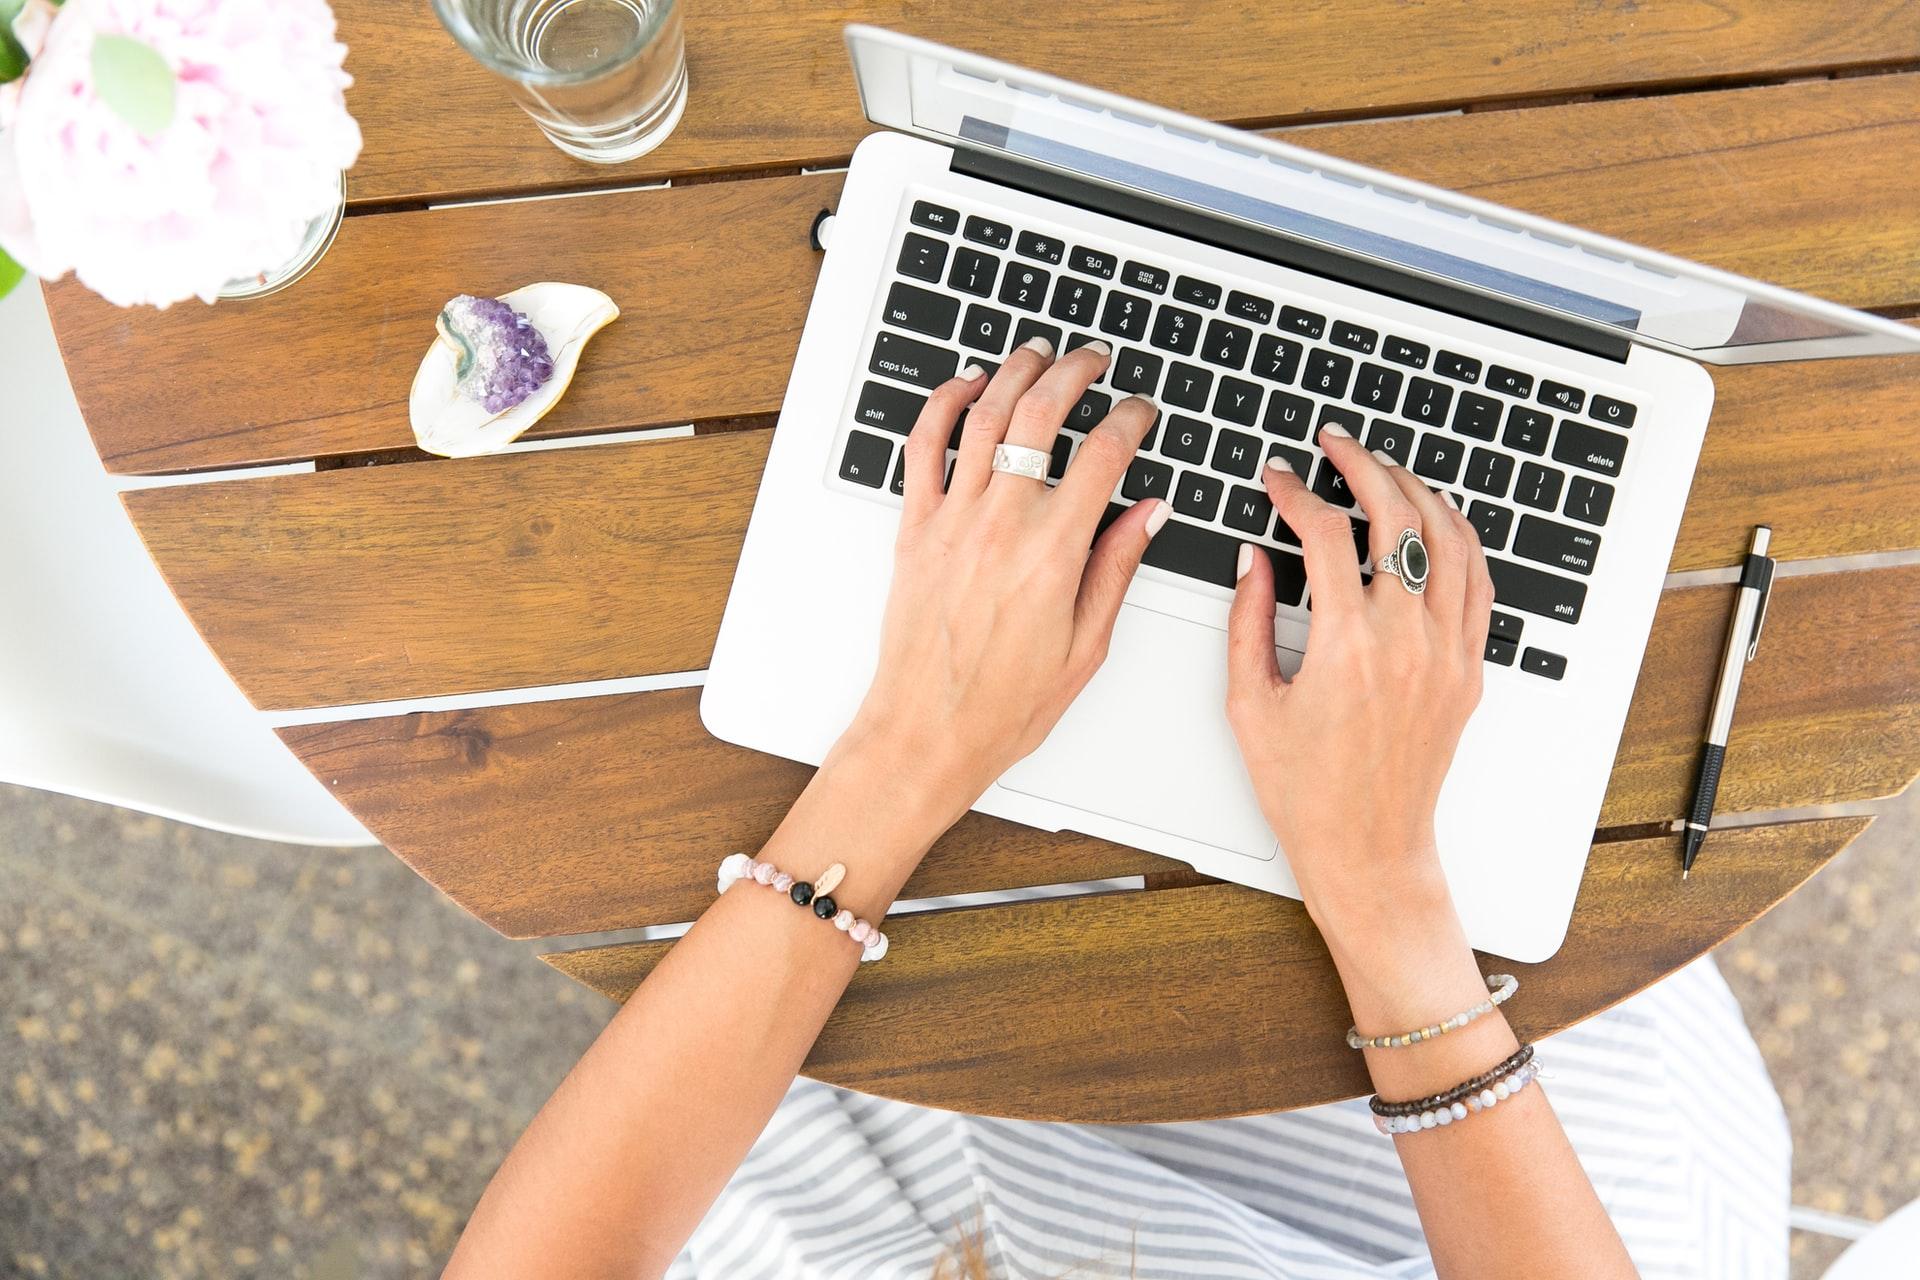 7 Reasons You Need to Hire a Seo Copywriter